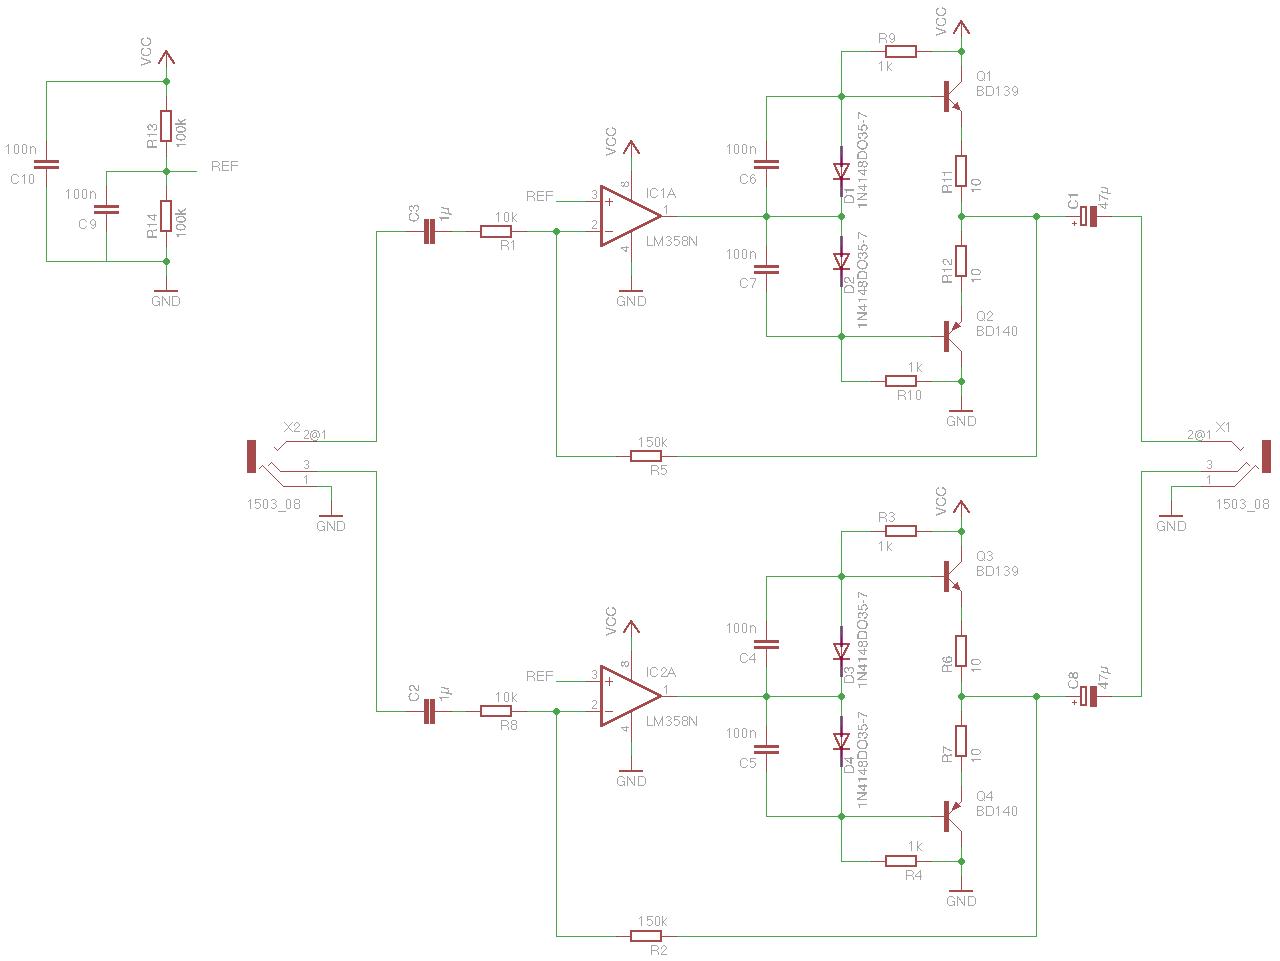 Charmant Lautsprecher Schaltplan Bilder - Schaltplan Serie Circuit ...